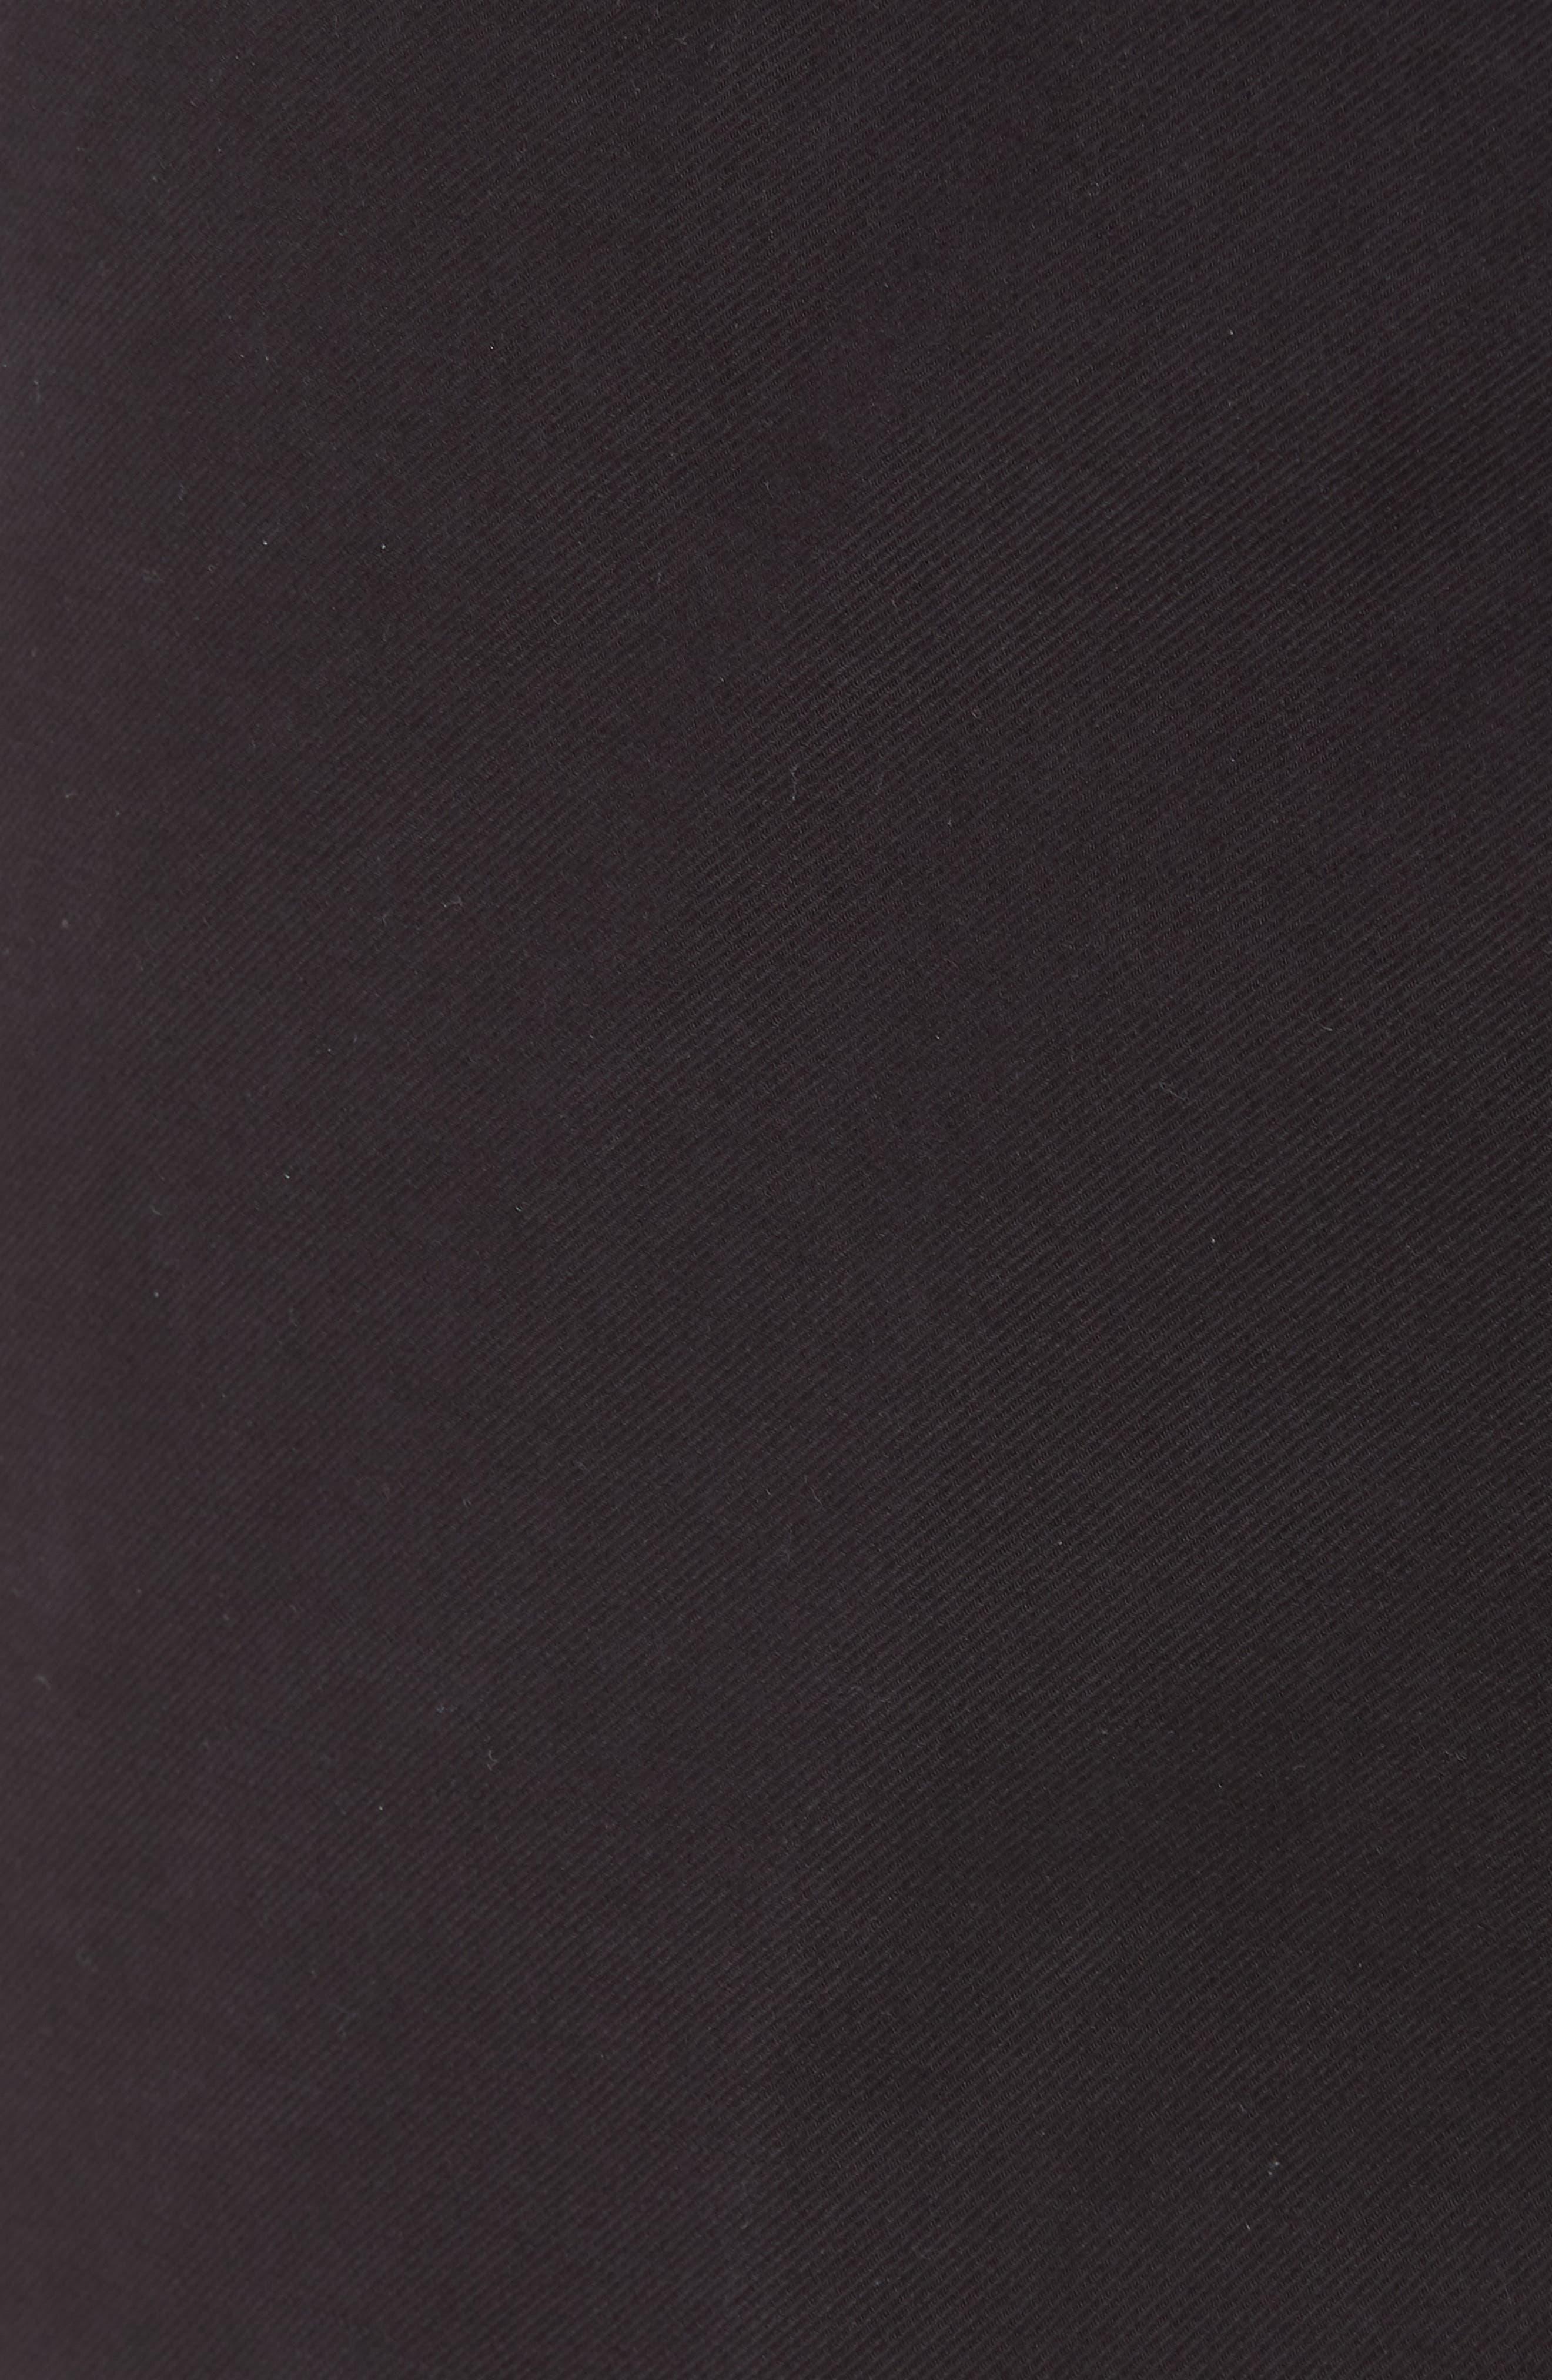 HUDSON JEANS,                             Slouchy Slim Fit Cargo Pants,                             Alternate thumbnail 5, color,                             001